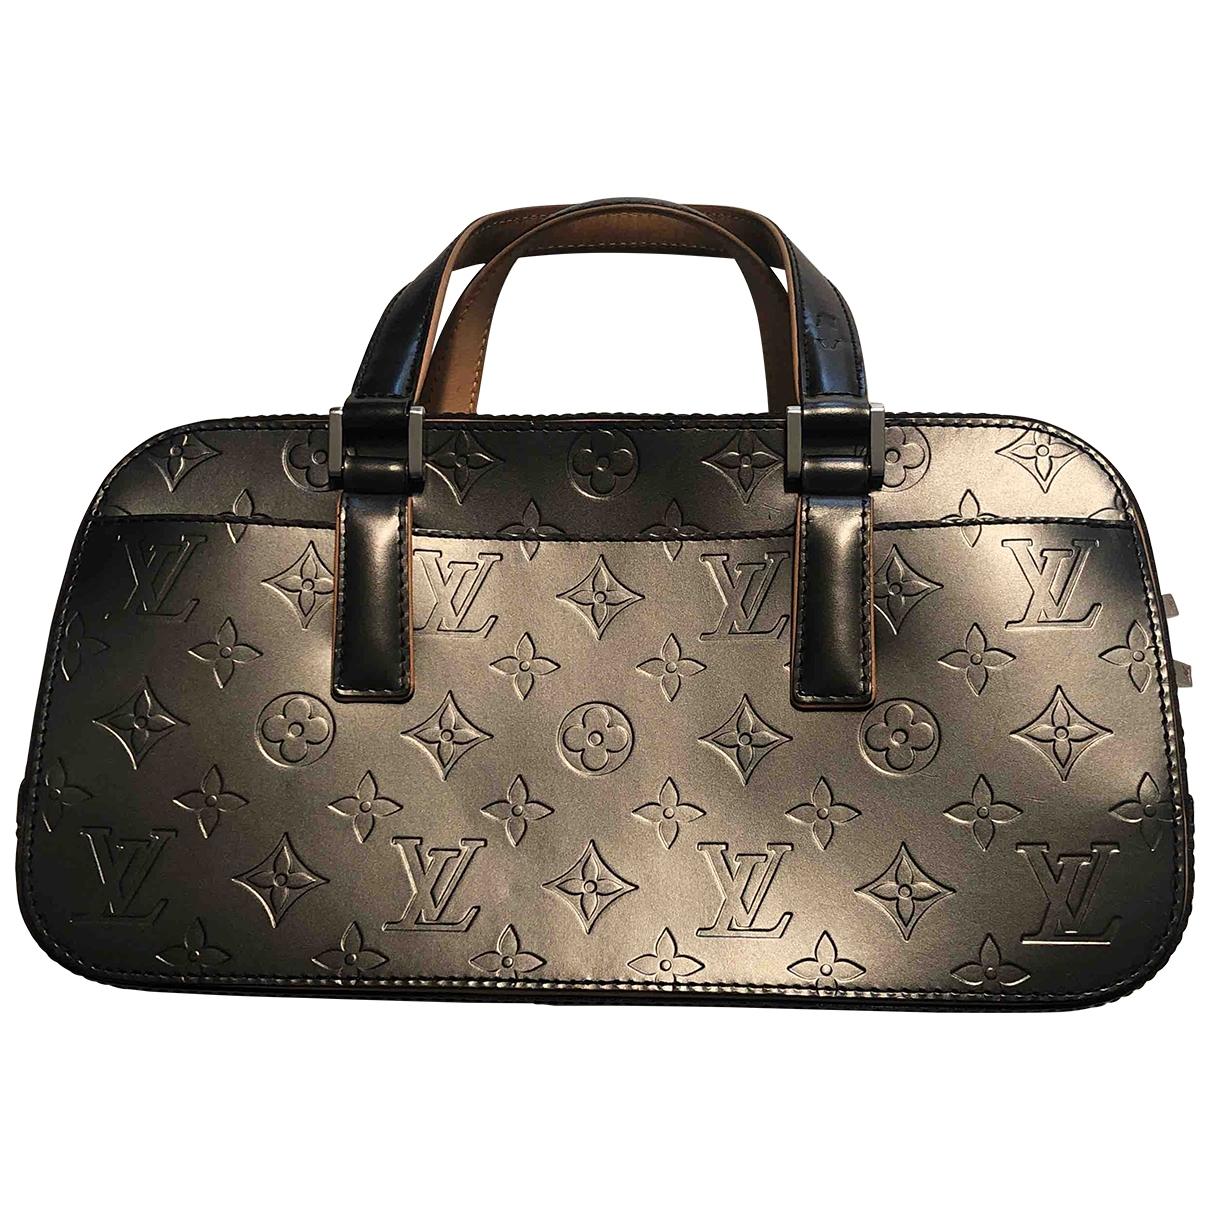 Louis Vuitton \N Black Leather handbag for Women \N